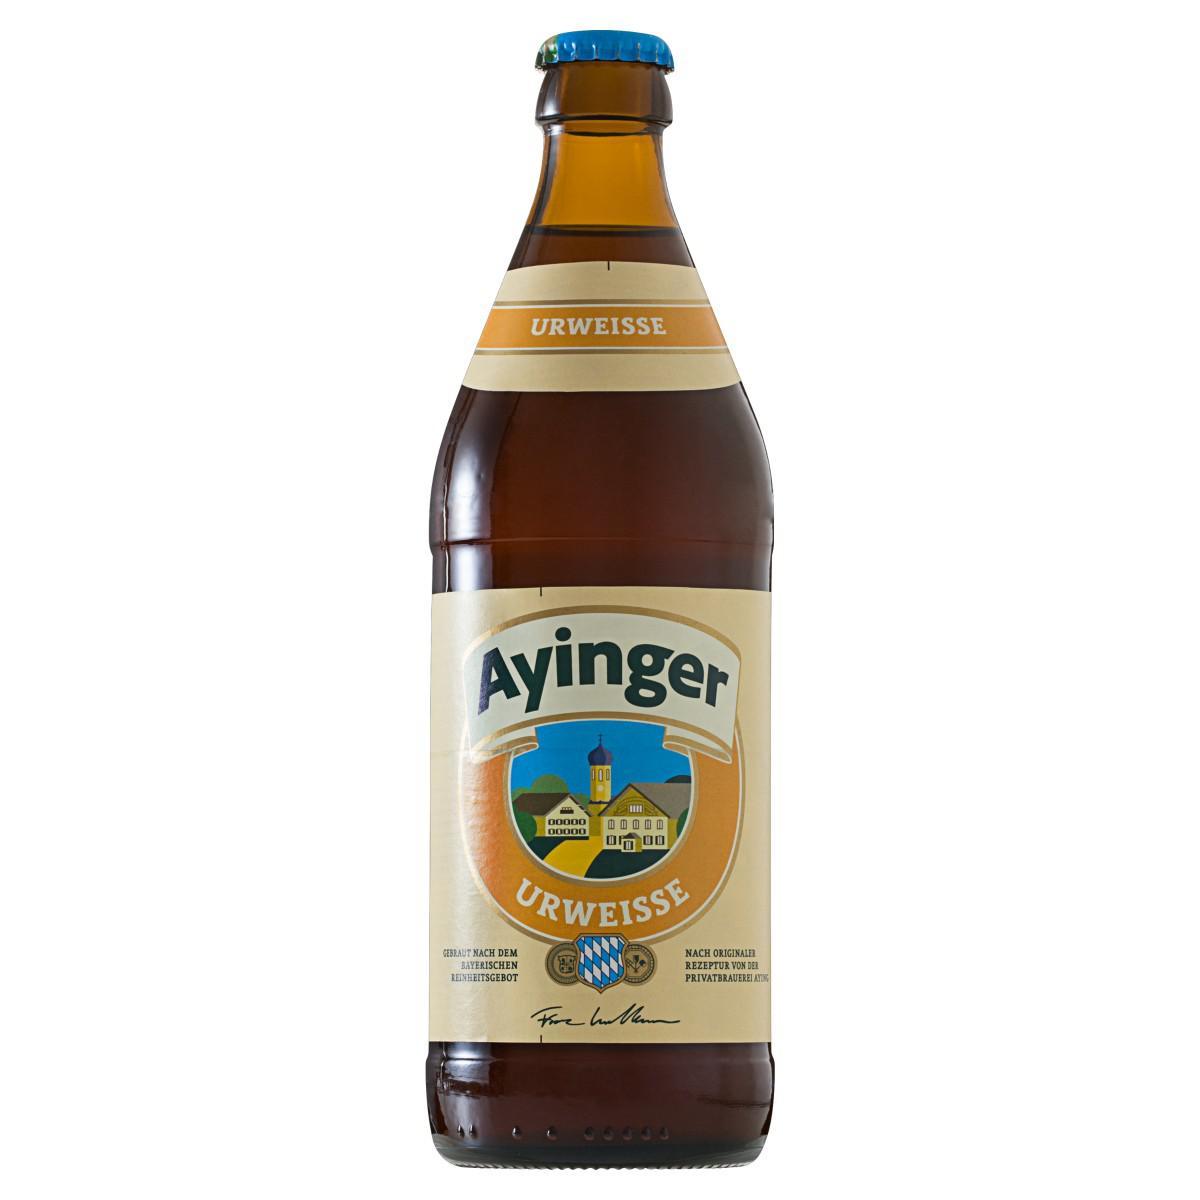 Cerveja Urweisse Ayinger Garrafa 500ml